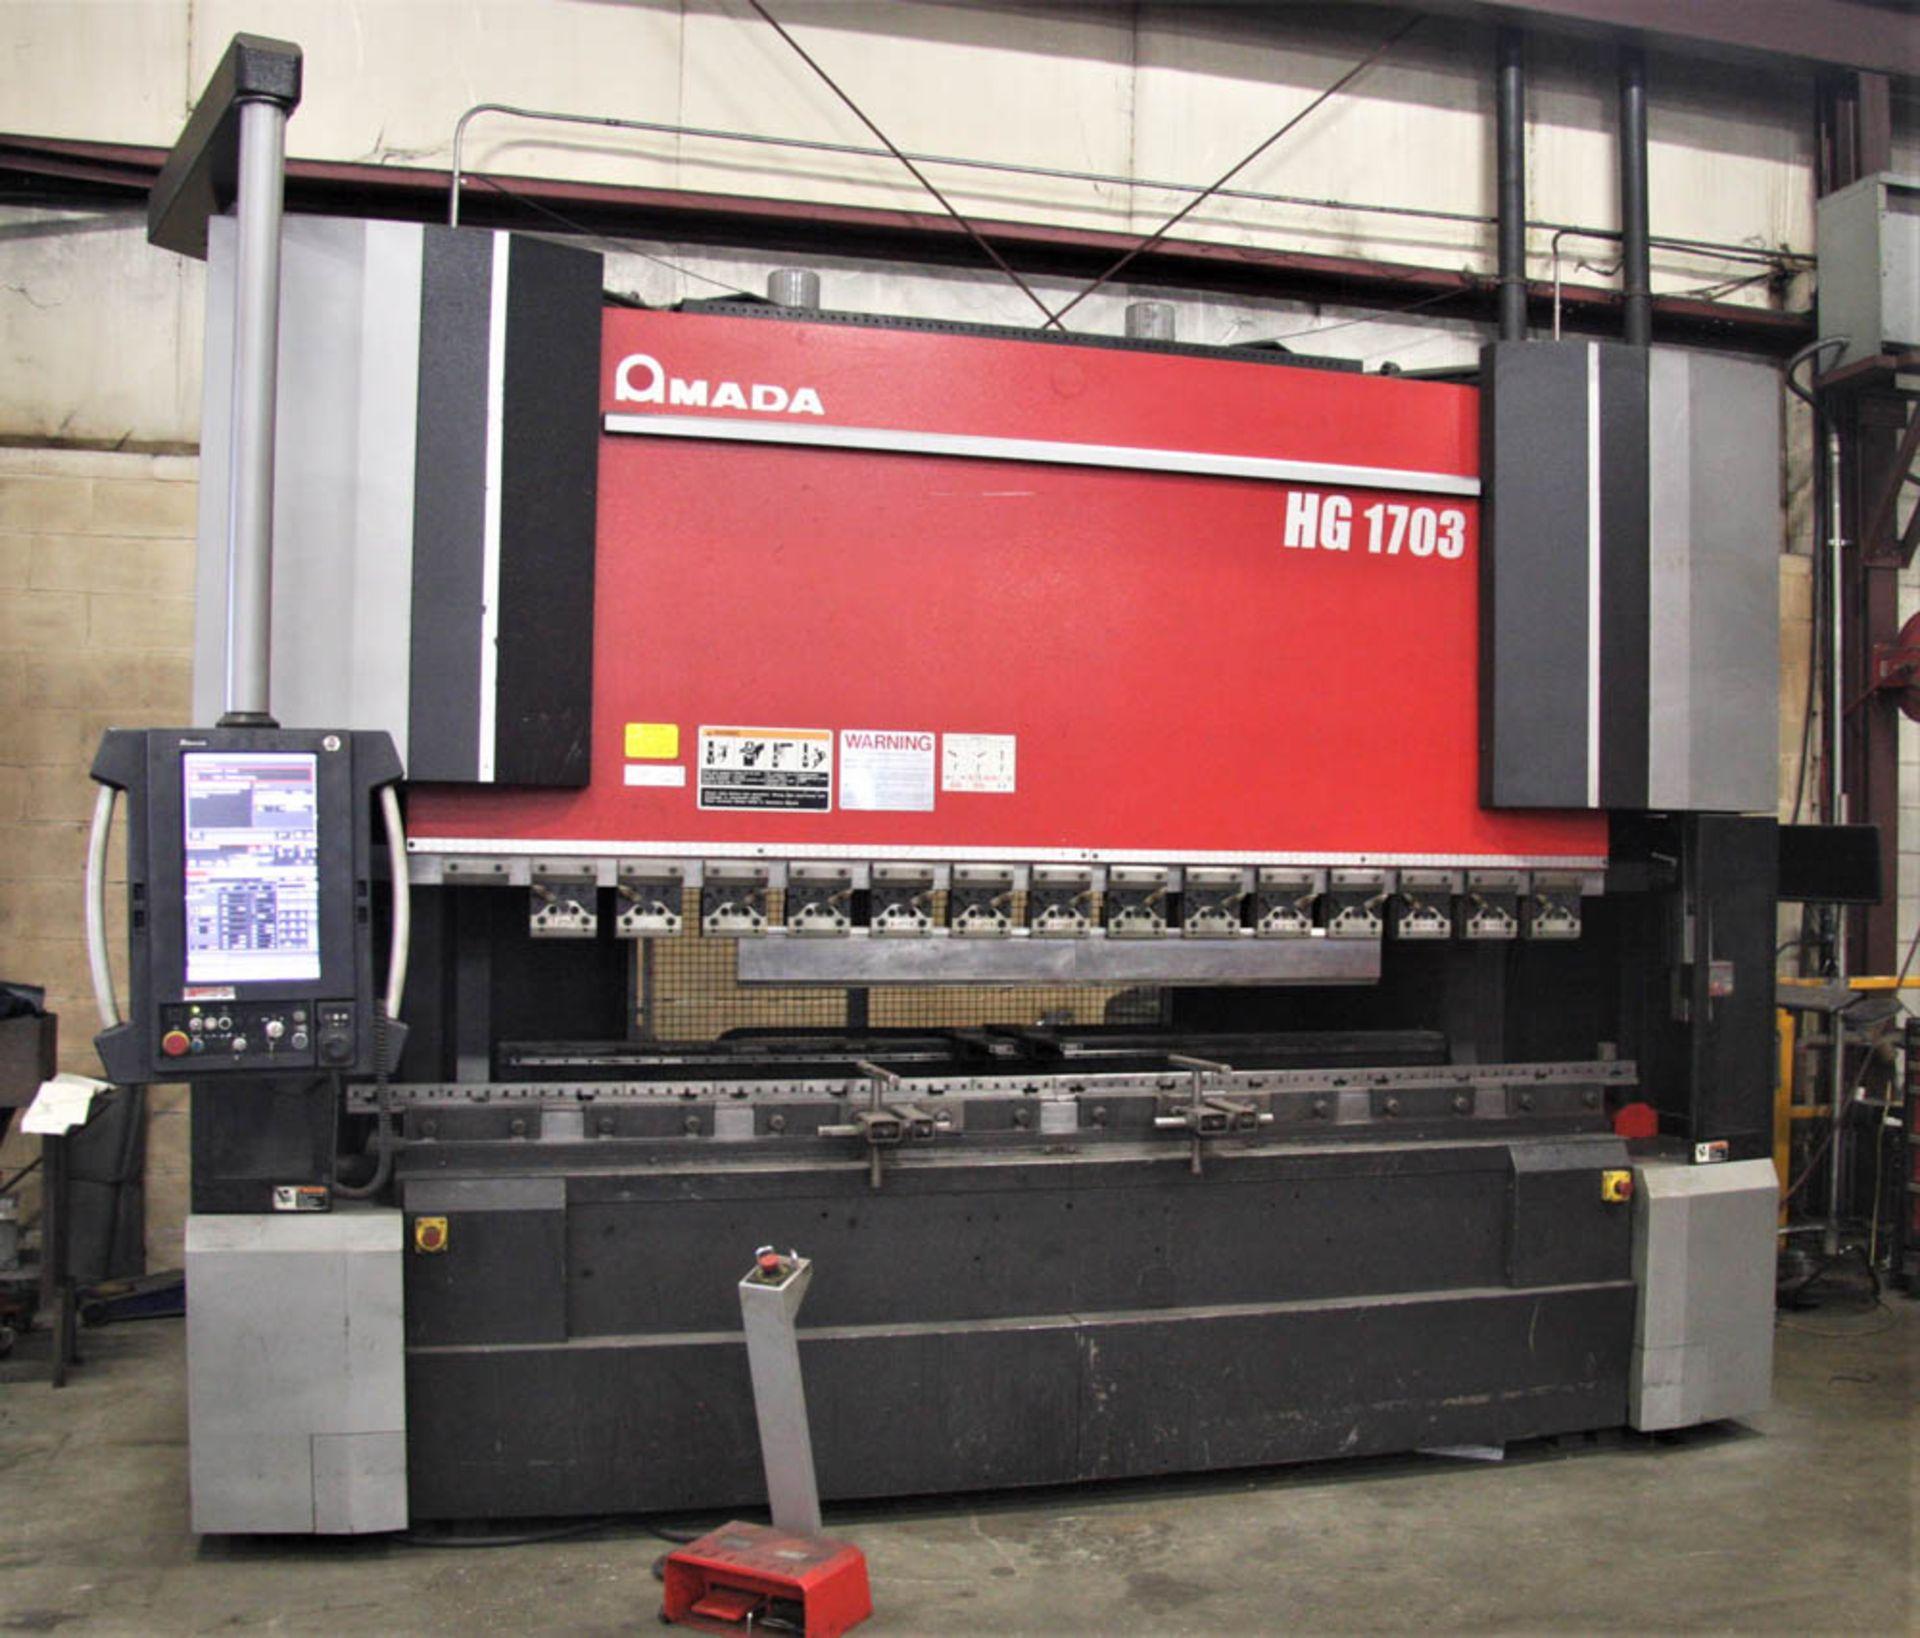 "2015 187 US TON X 122"" AMADA MDL. HG1703 CNC PRESS BRAKE, AMNC 3i CONTROL, 122"" MAX BEND LENGTH"